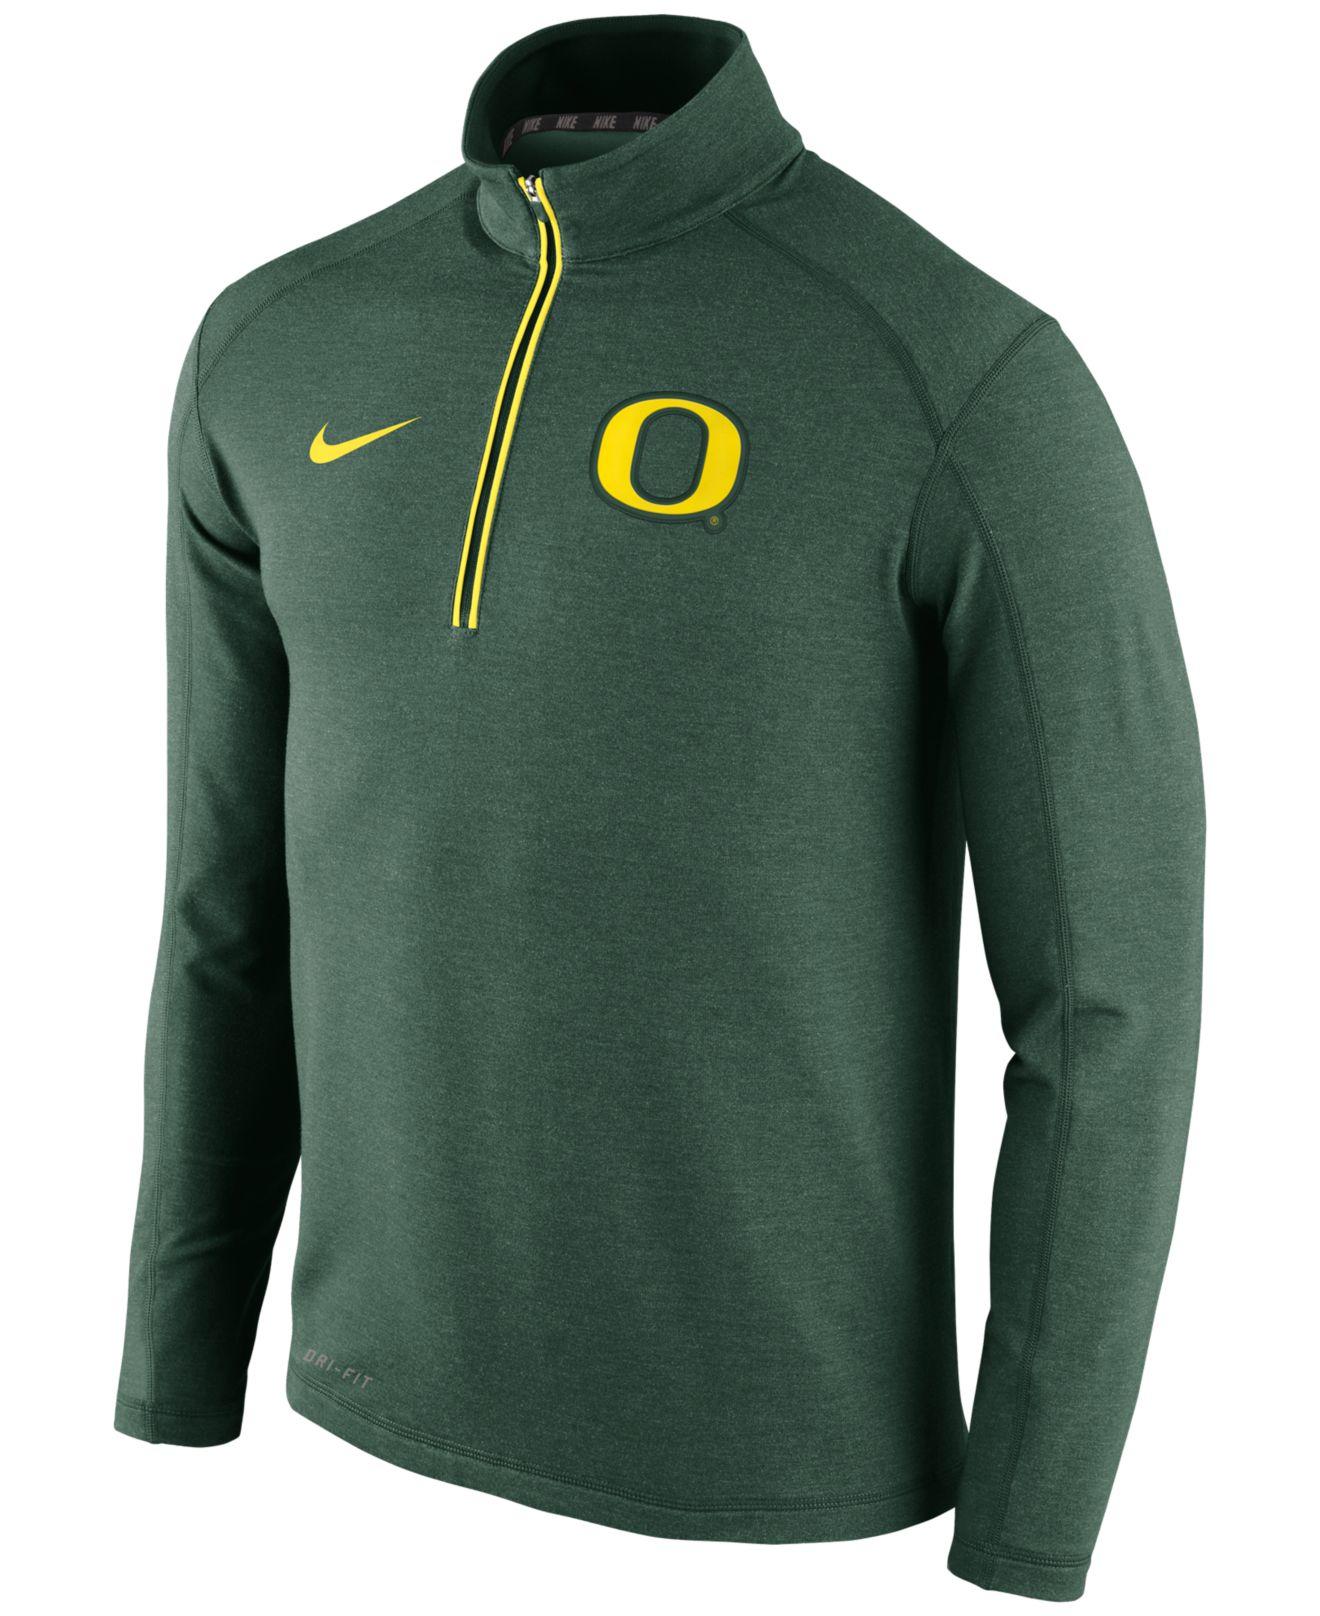 Oregon Ducks Jacket